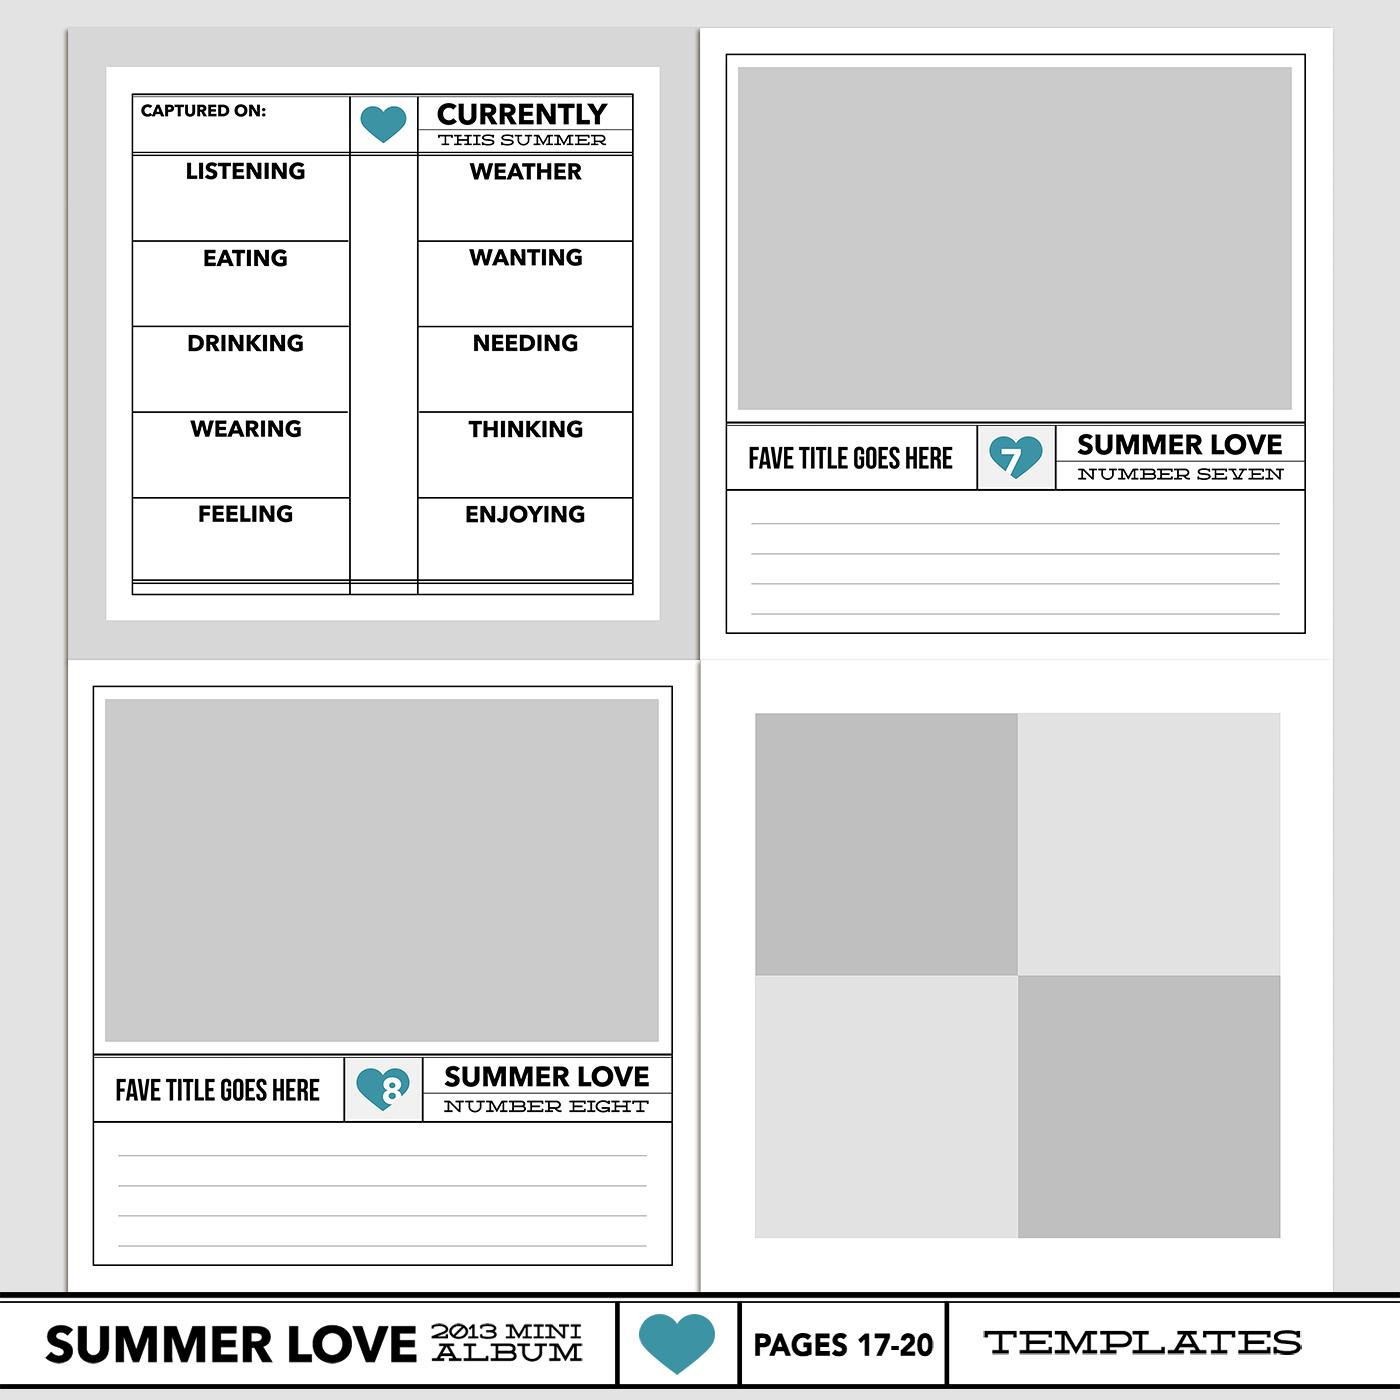 nettiodesigns_SummerLove-pg17-20-templates-1400